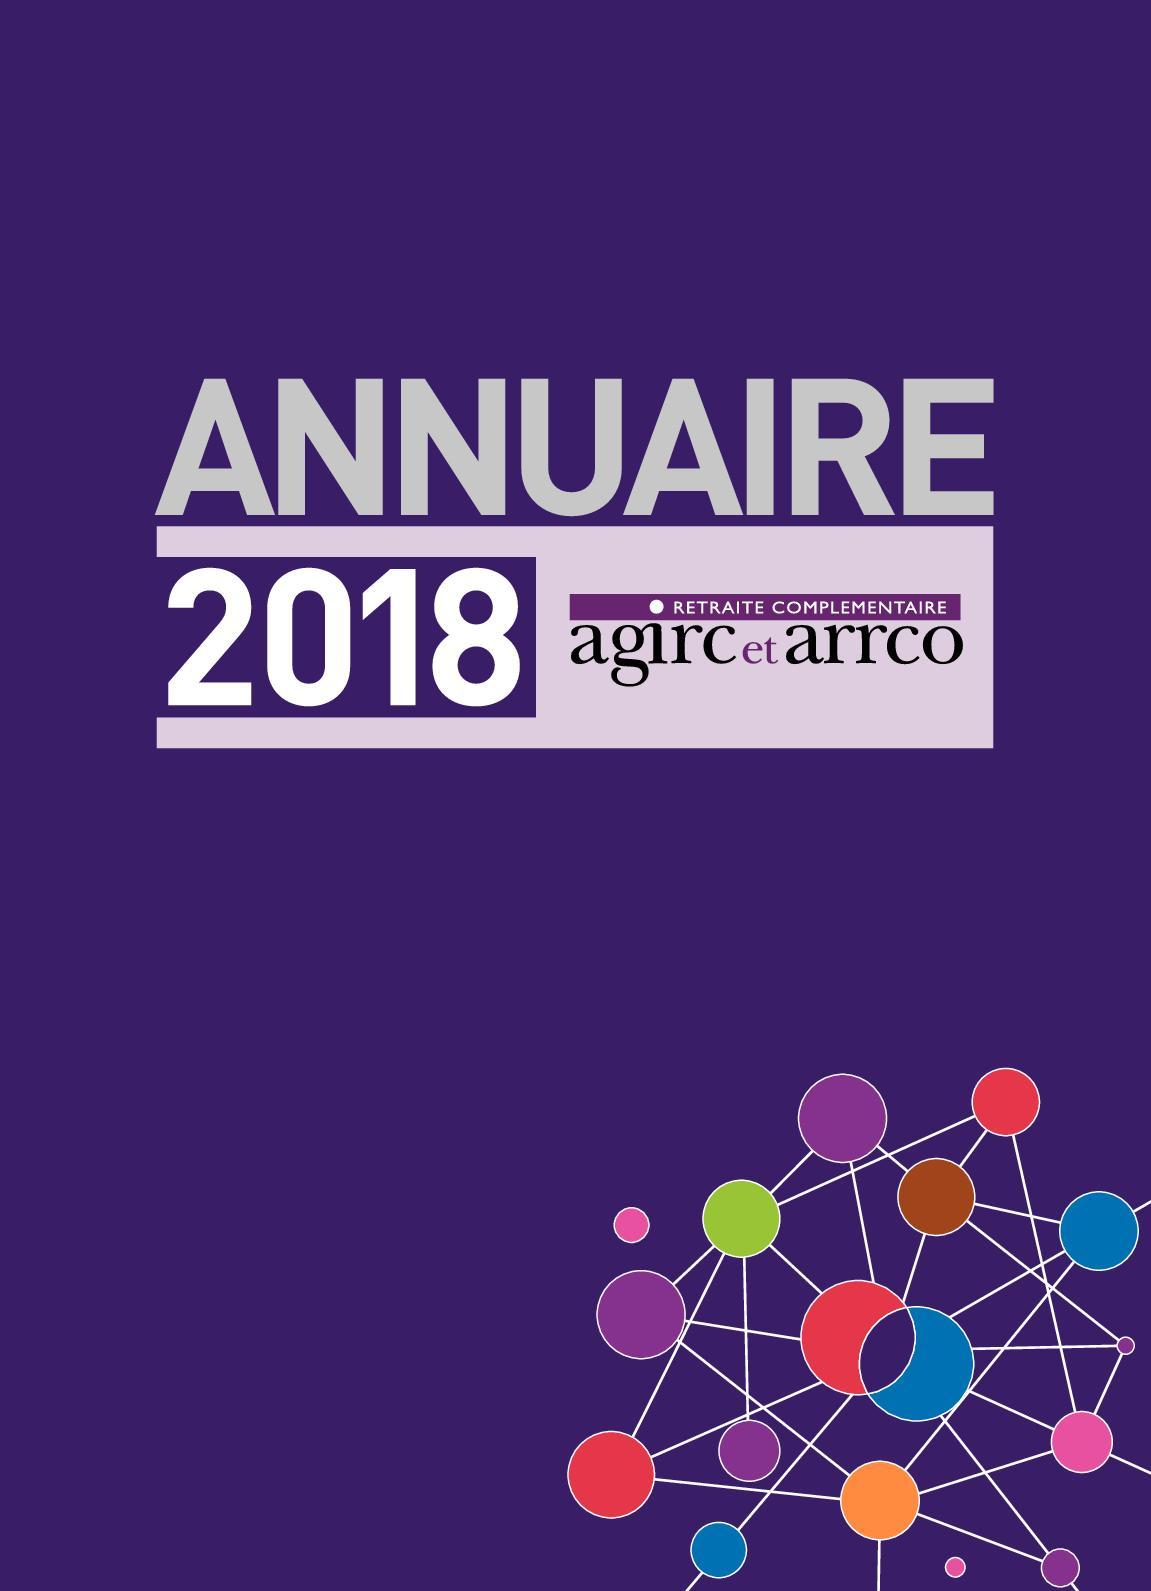 Calaméo - Annuaire agirc-Arrco 2018 6e94fe2cf4d7